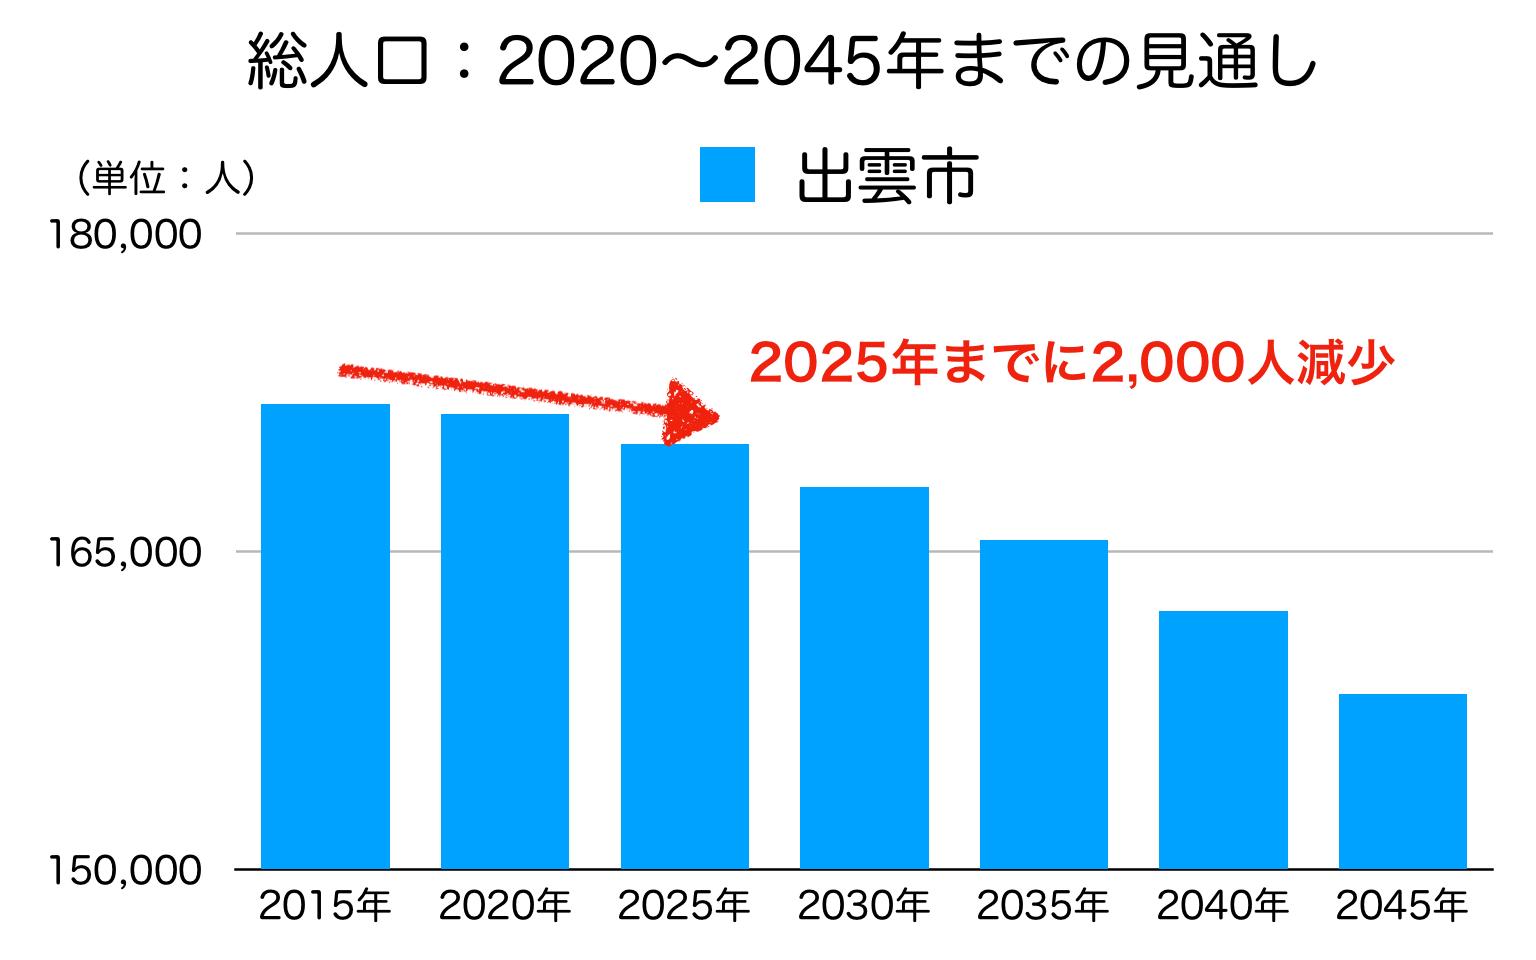 出雲市の人口予測